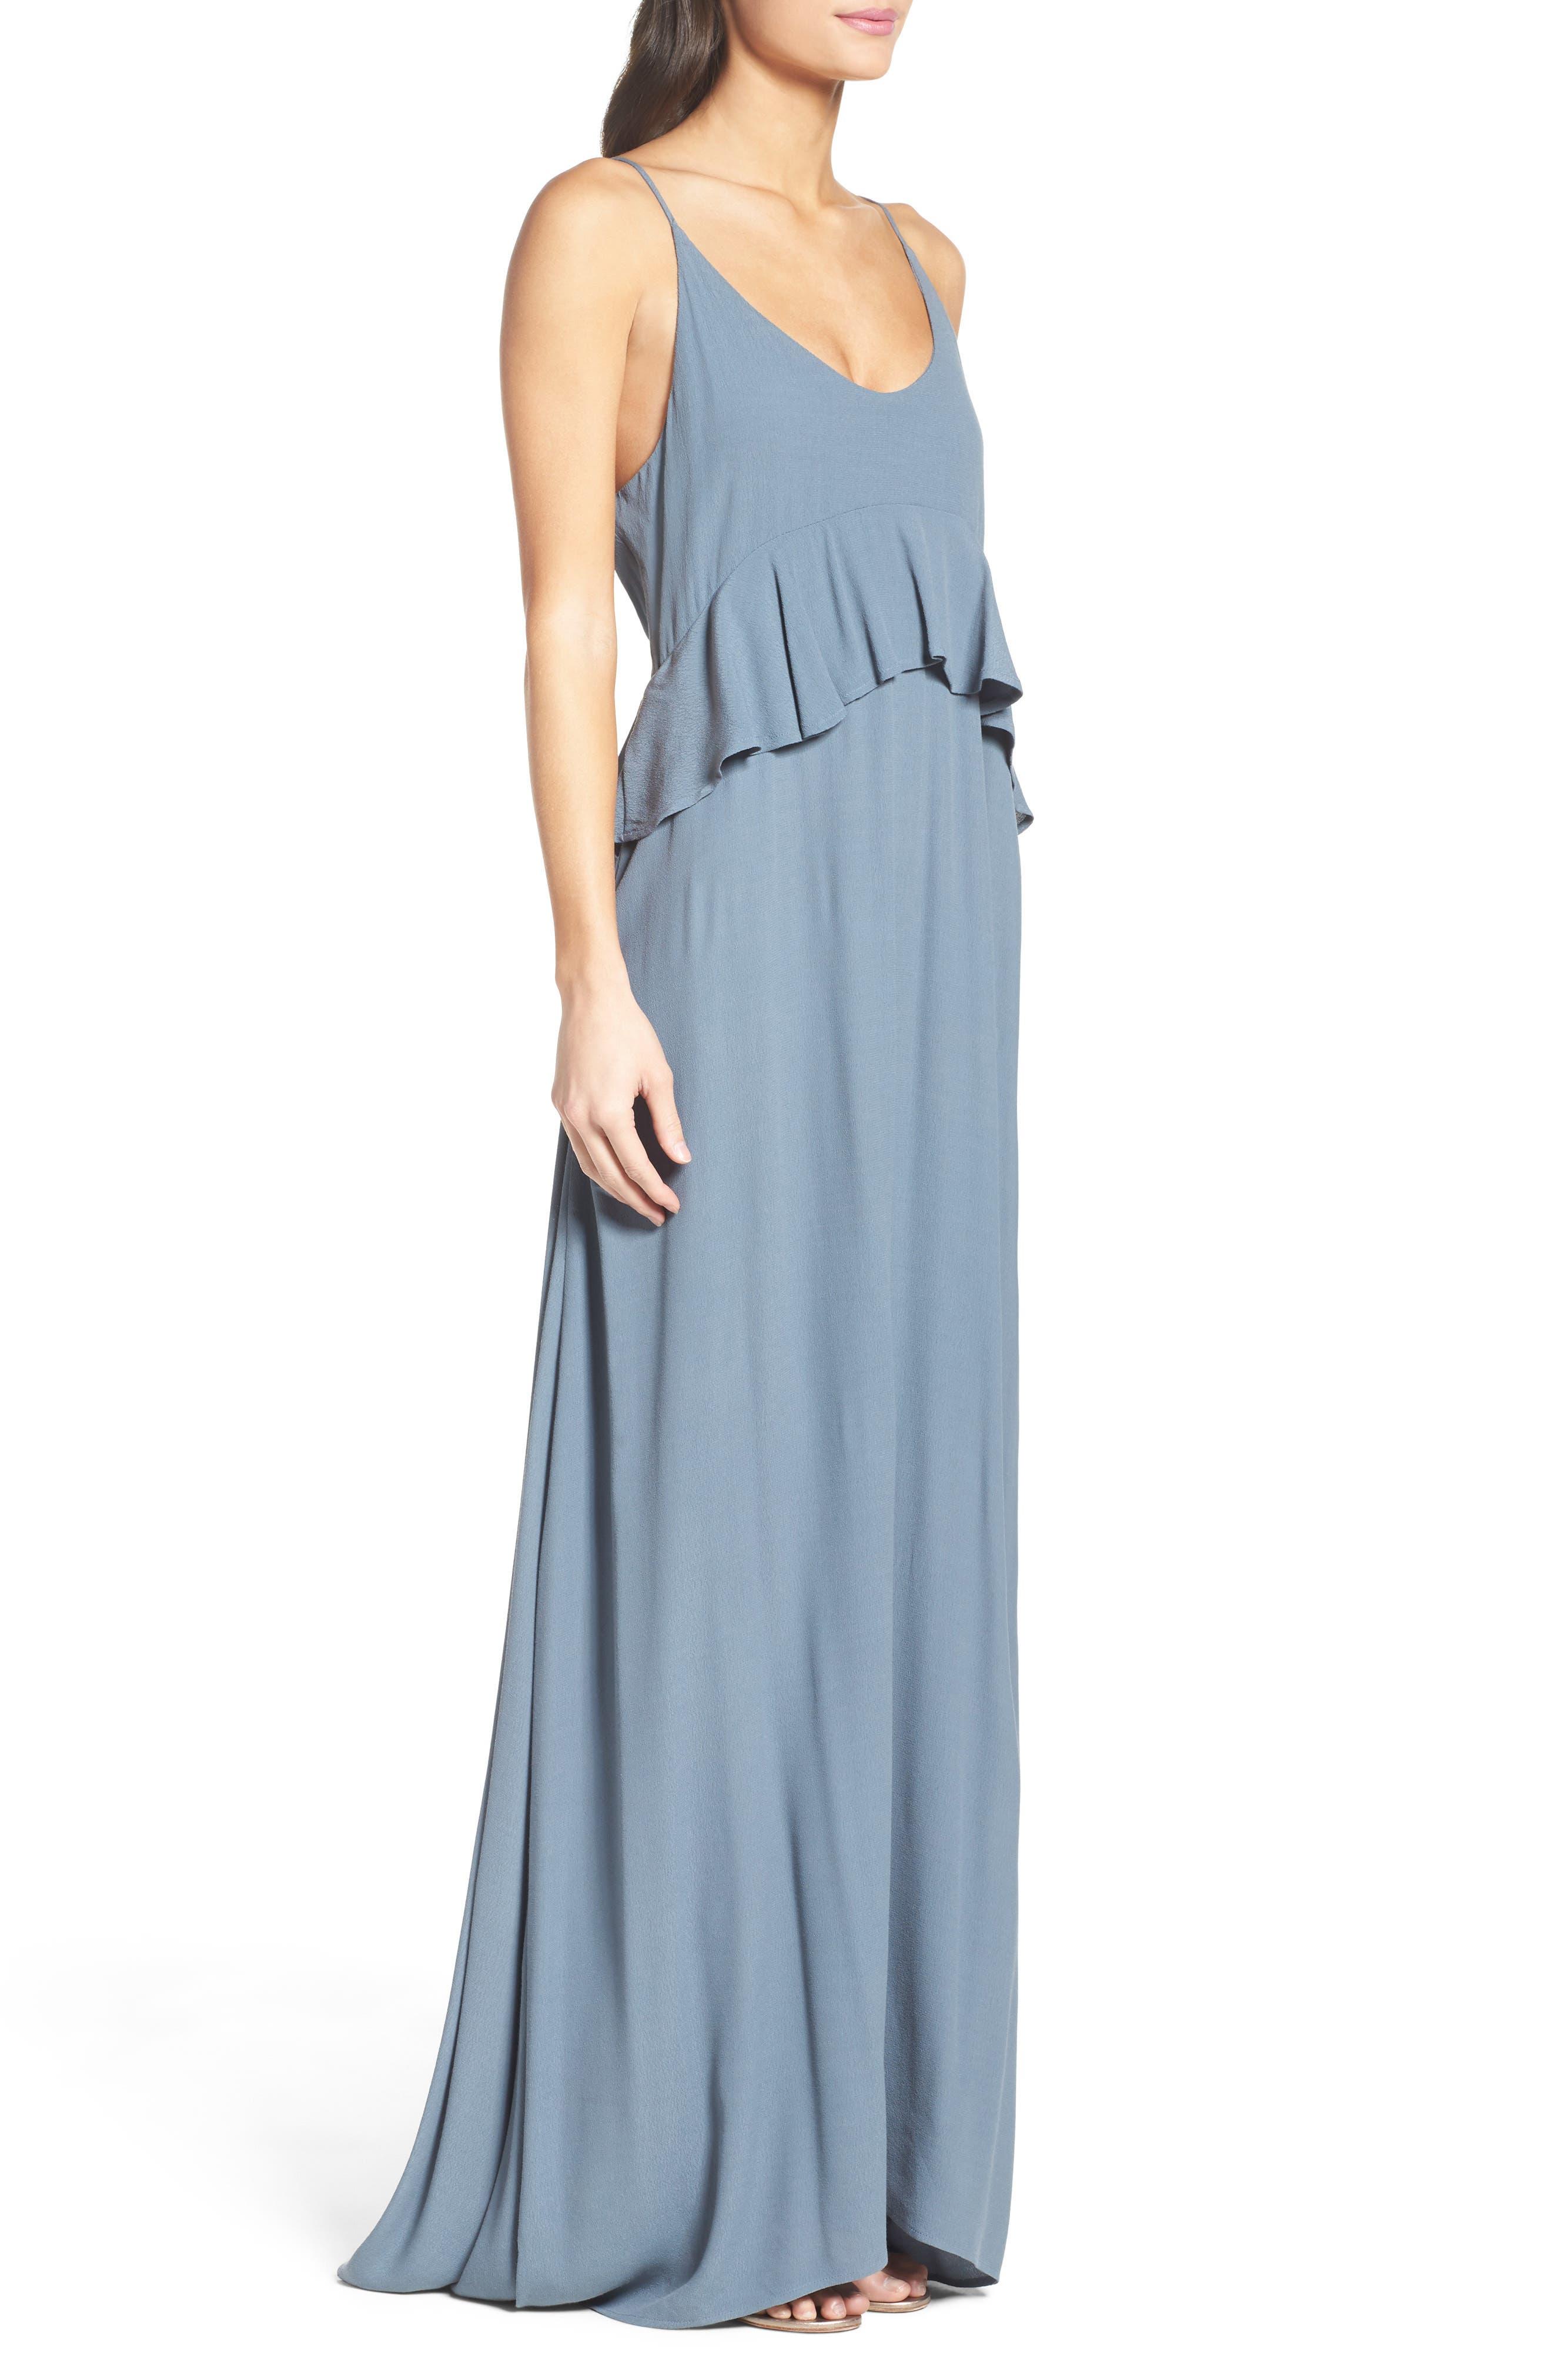 Roe + May Jolie Crepe Peplum Dress,                             Alternate thumbnail 6, color,